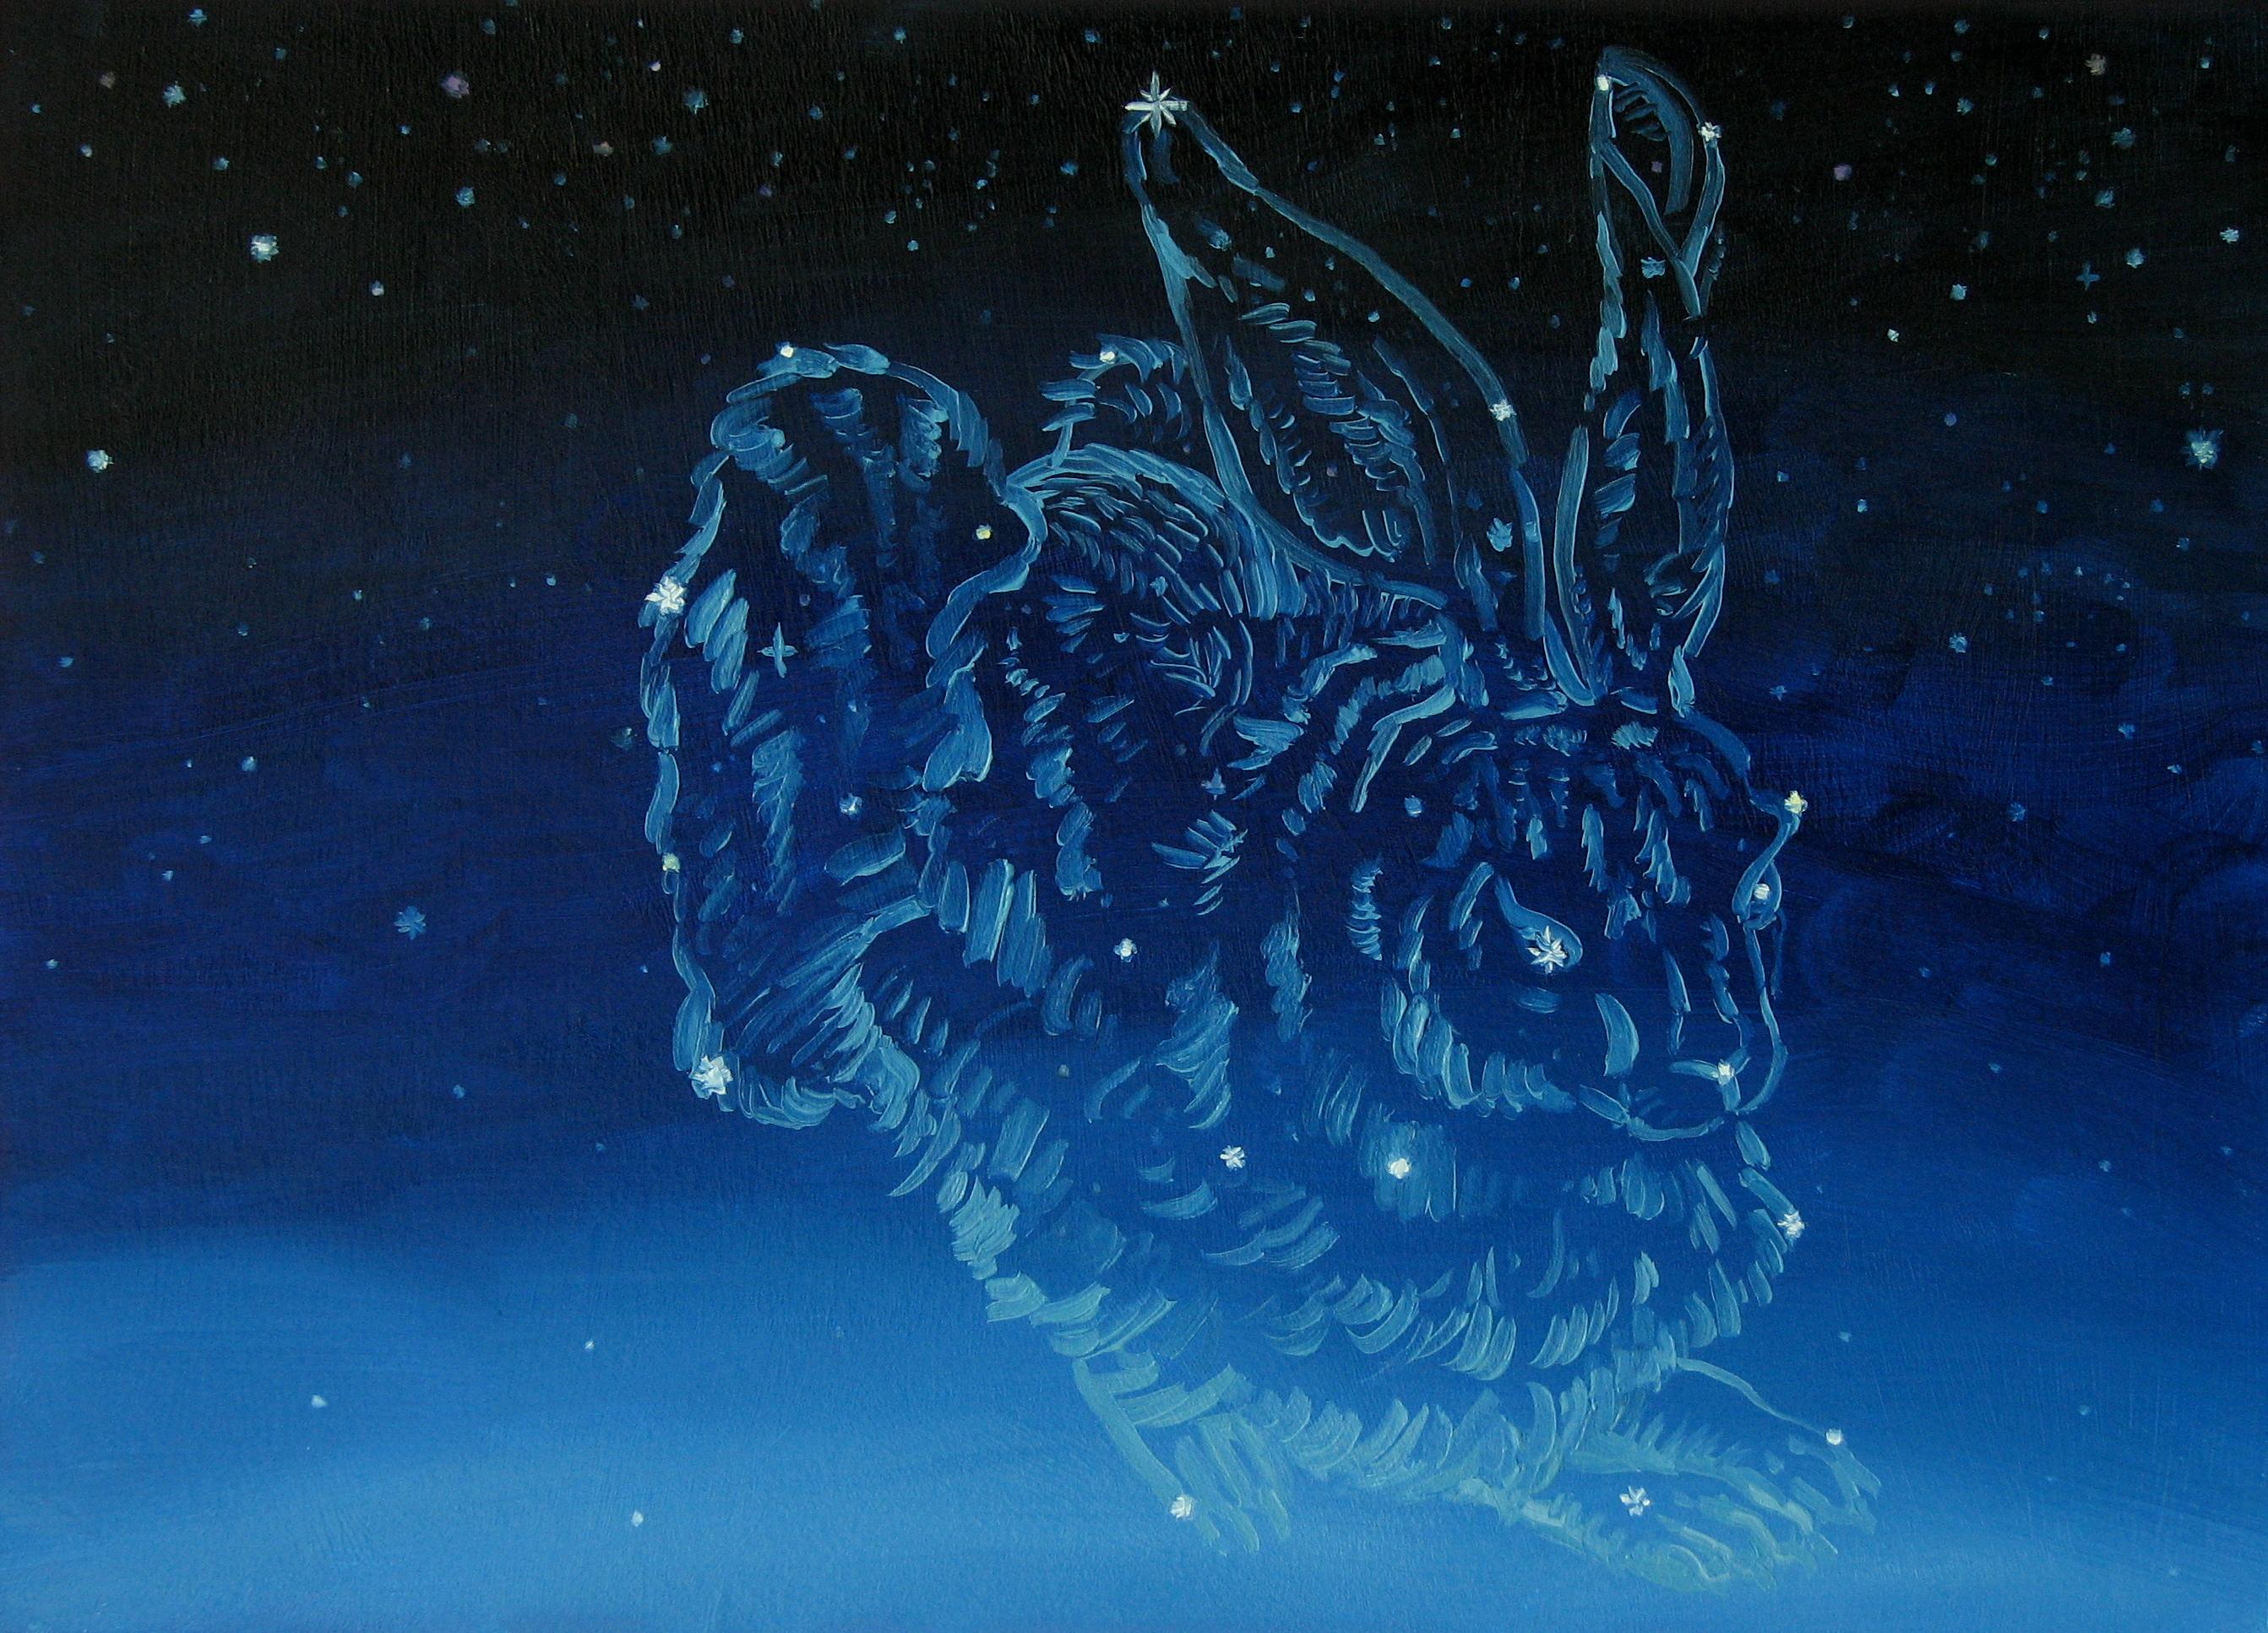 Blue Whale Wallpaper Hd Constellations Mike Schultz Studio Blog